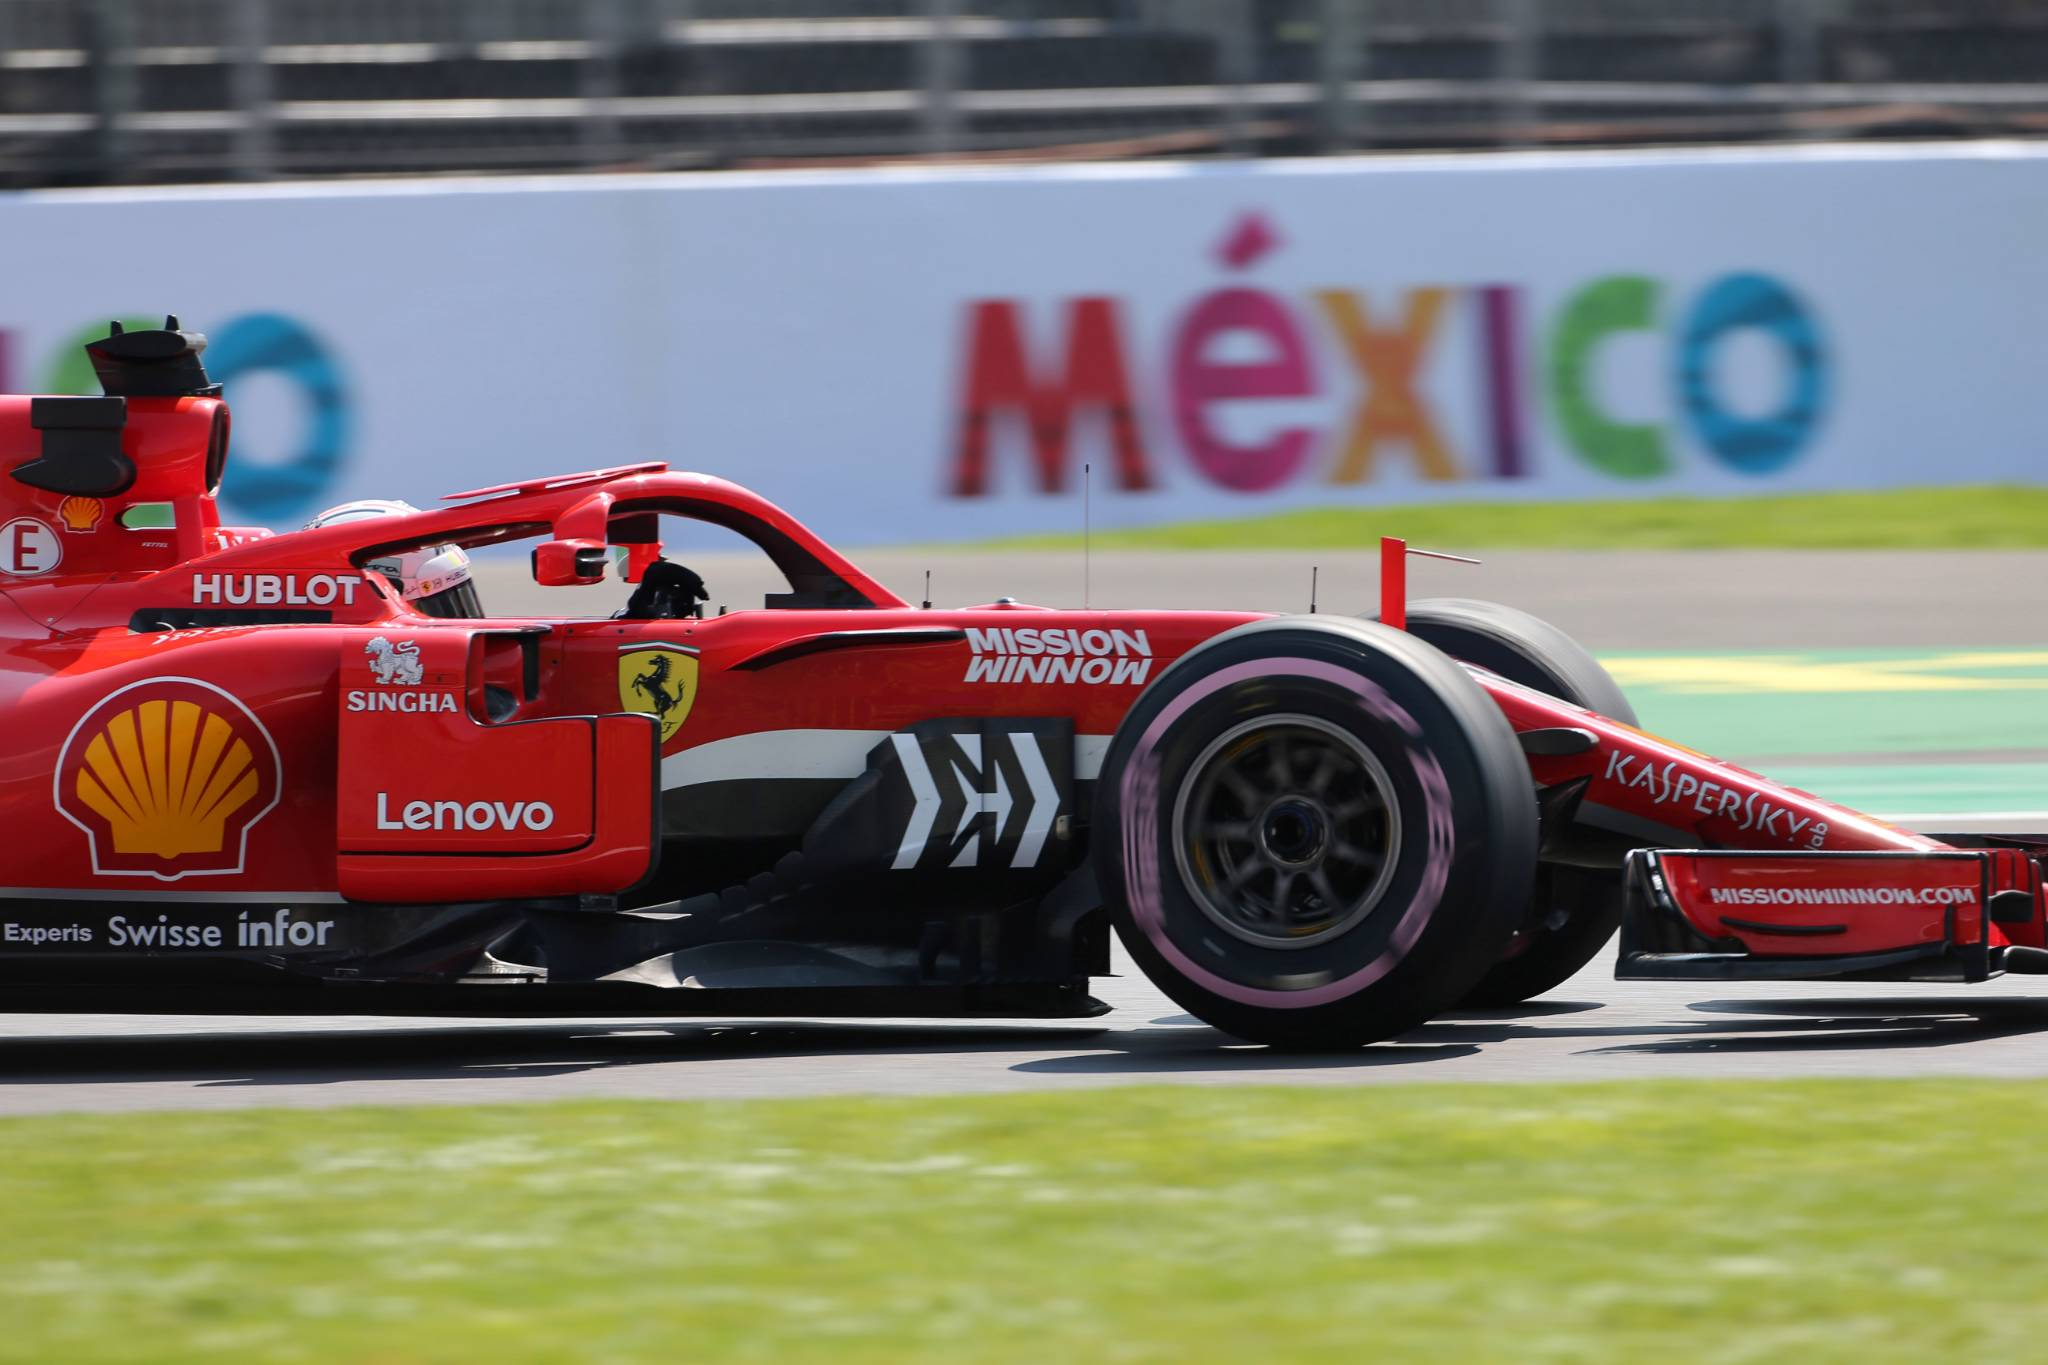 26.10.2018 - Free Practice 2, Sebastian Vettel (GER) Scuderia Ferrari SF71H